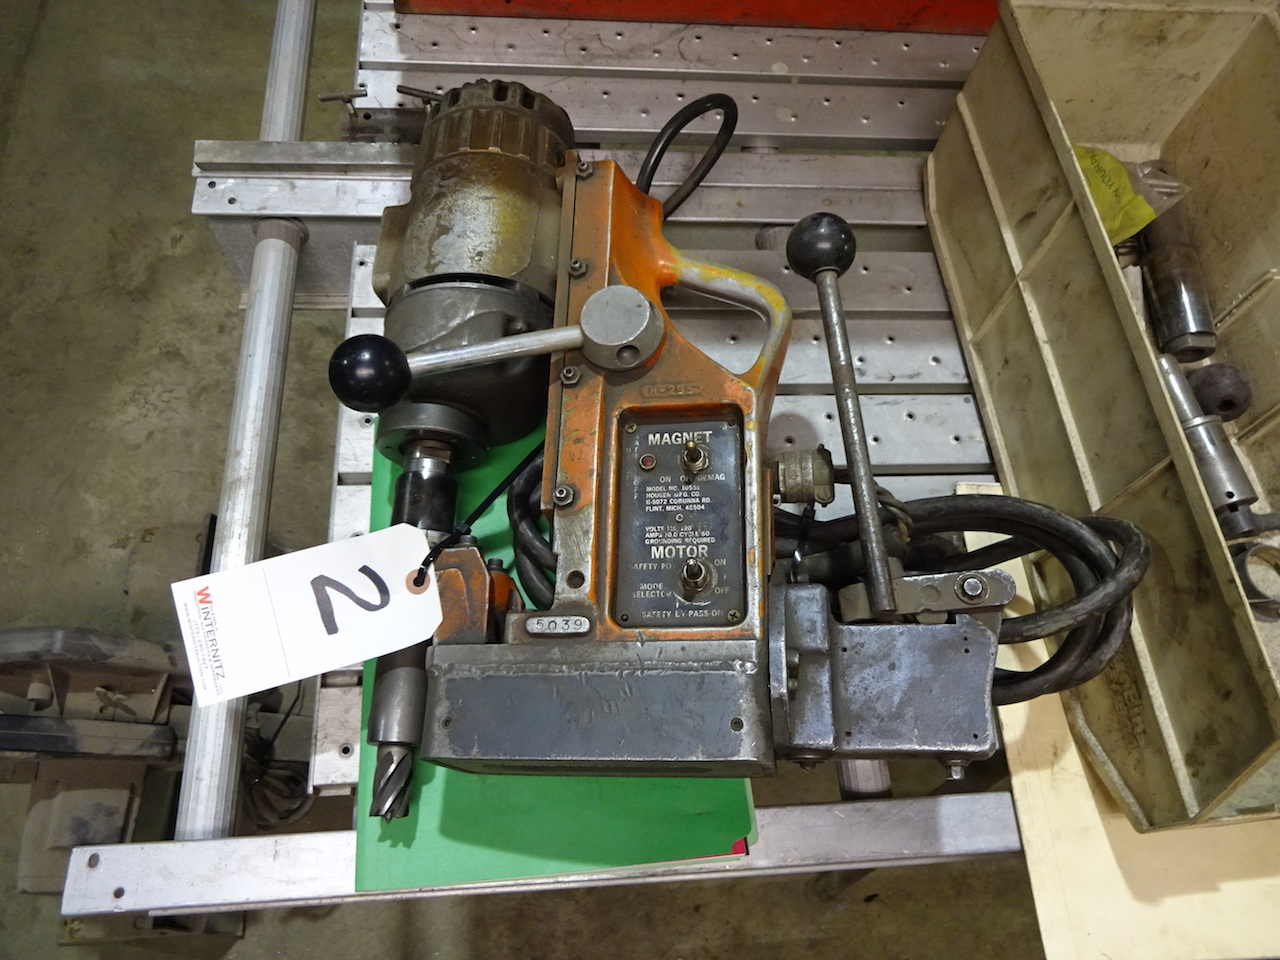 Lot 2 - Hougen Magnetic Base Drill